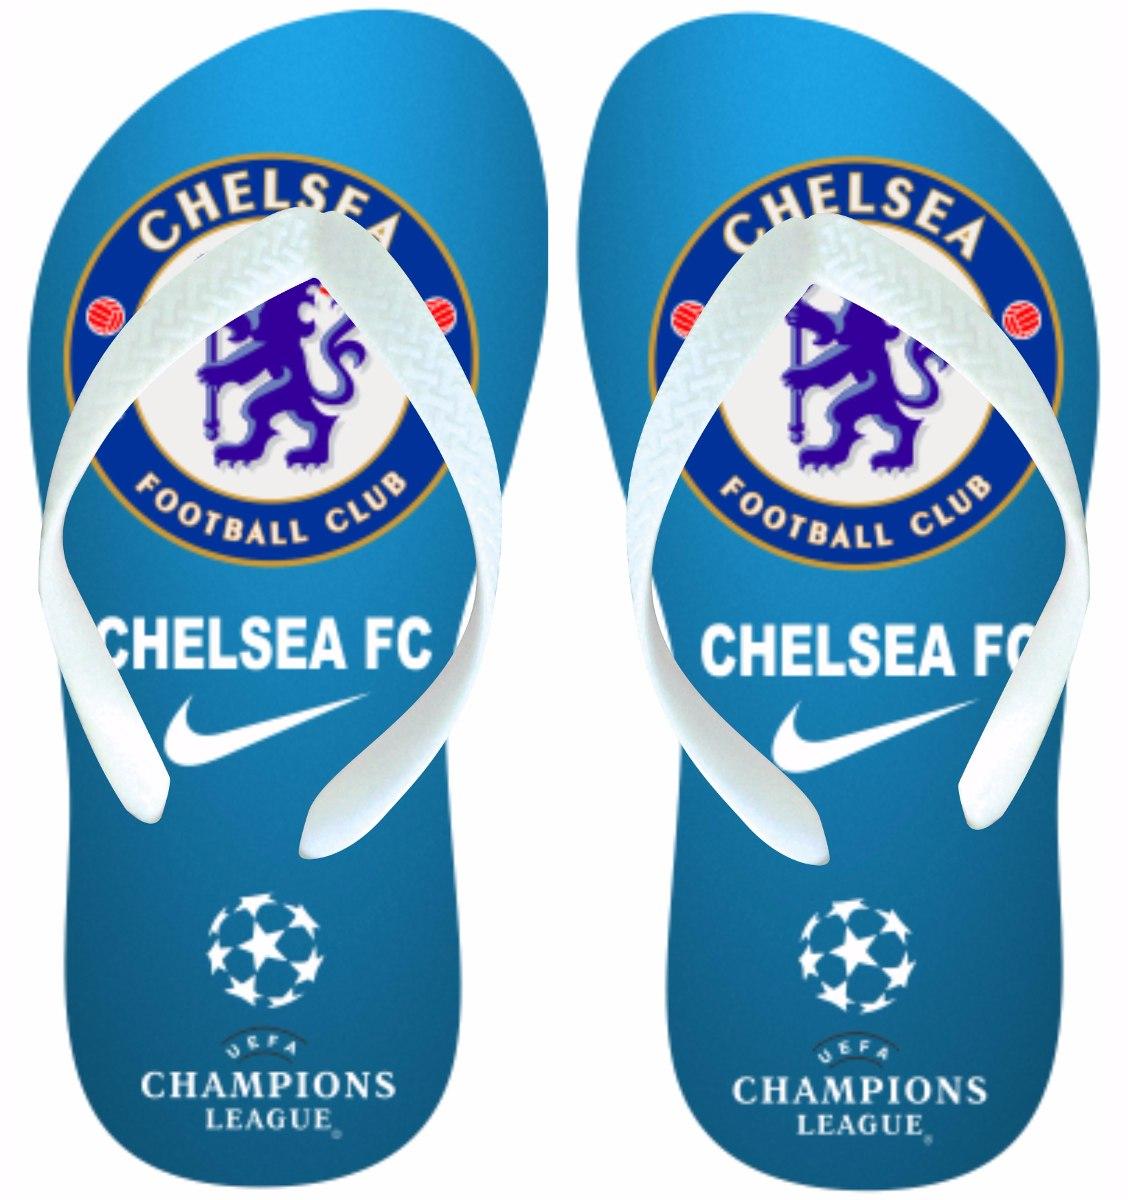 d5c8a39b1dfed Chinelo Chelsea Personalize O Seu! - R  19